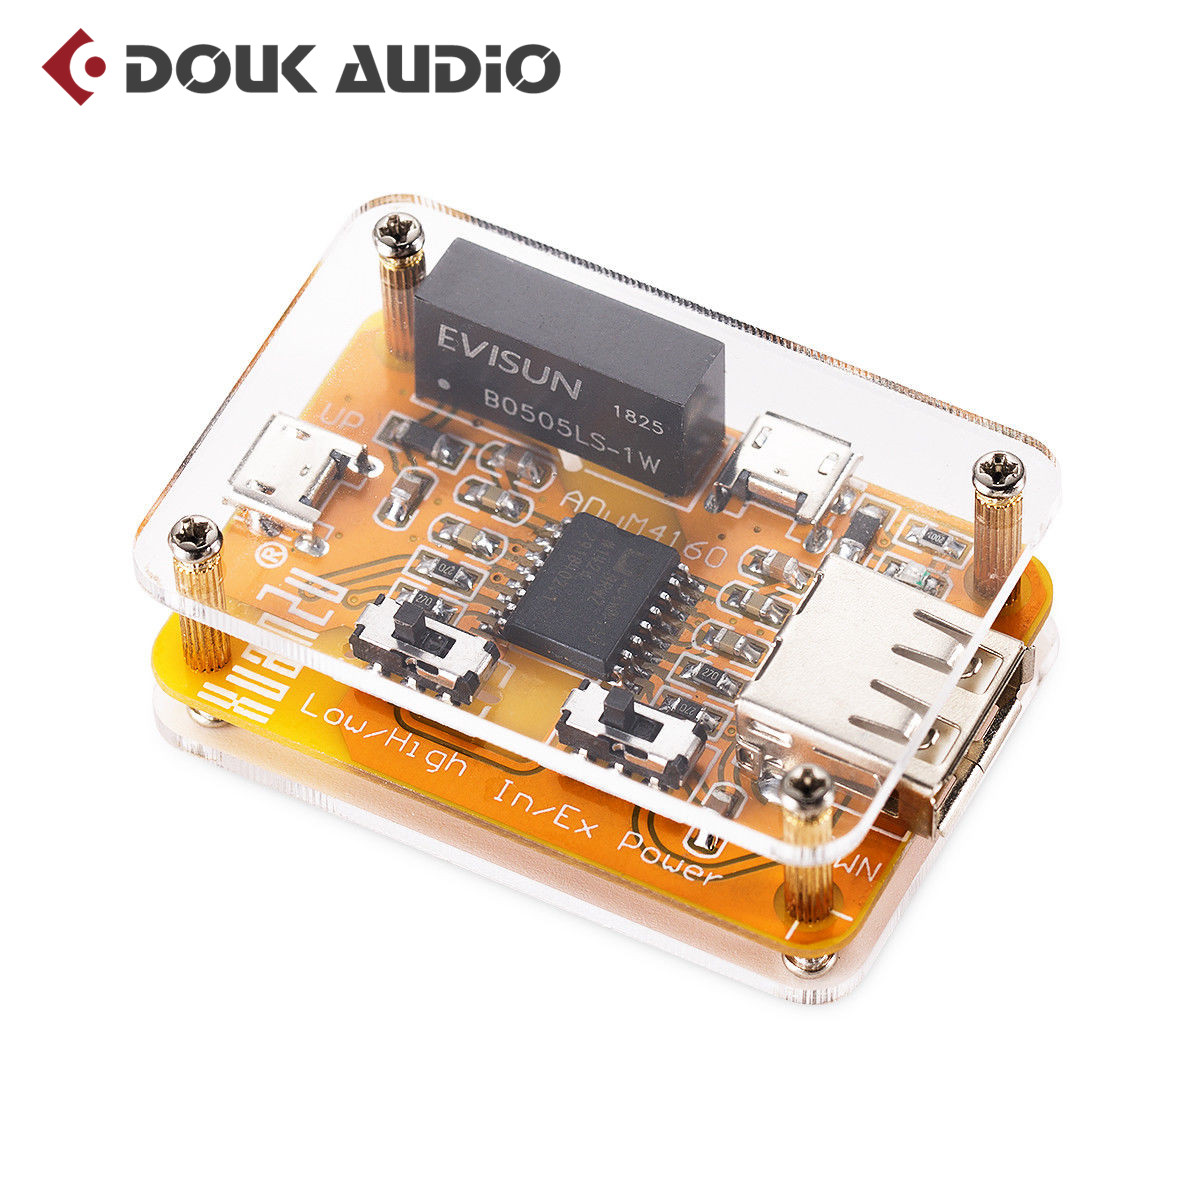 Nobsound adum4160 usb para usb módulo isolador de áudio eliminador ruído industrial isolador proteção 1500 v módulo digital